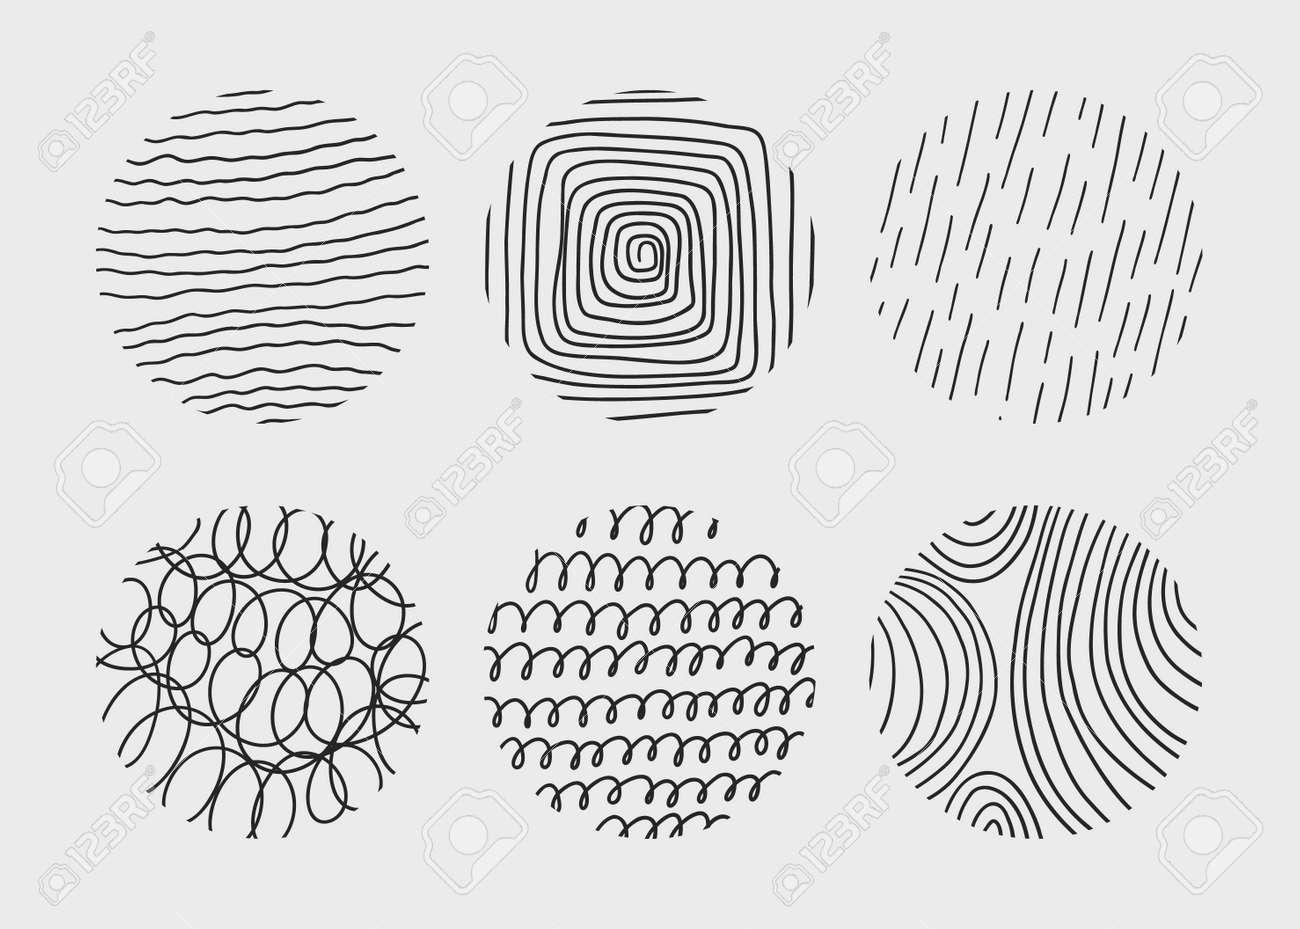 Circle creative minimalism contemporary artwork. Hand drawn doodle shapes. - 169711282